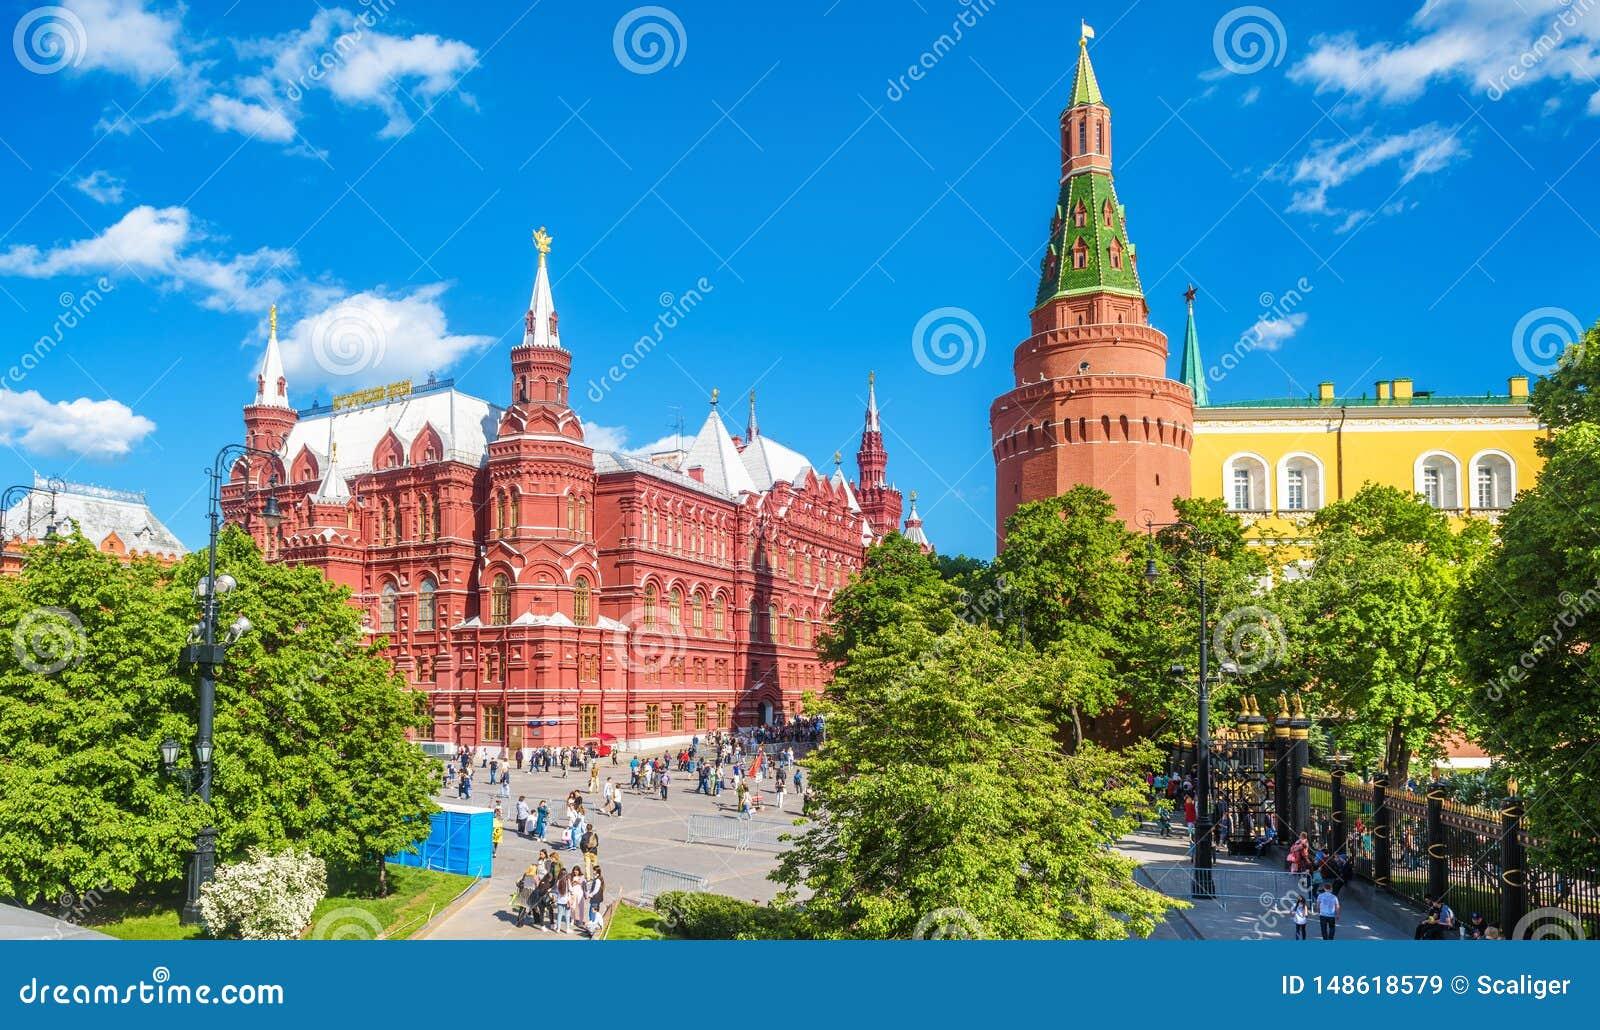 Panorama del quadrato di Manezhnaya dal Cremlino di estate, Russia di Mosca